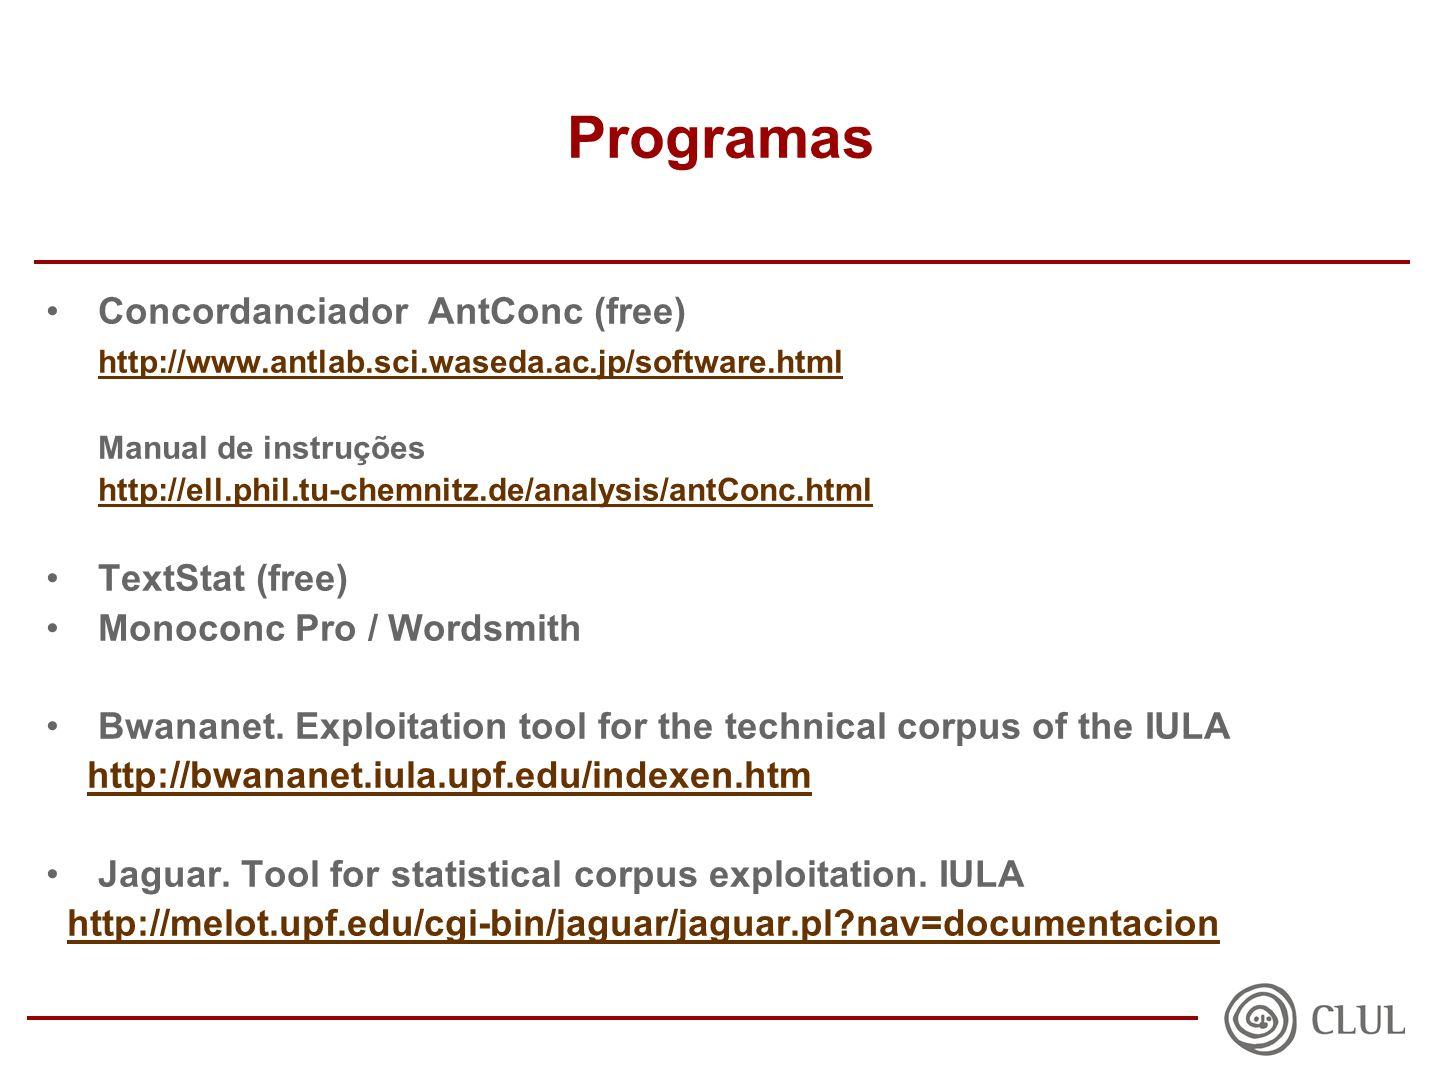 Programas Concordanciador AntConc (free) http://www.antlab.sci.waseda.ac.jp/software.html Manual de instruções http://ell.phil.tu-chemnitz.de/analysis